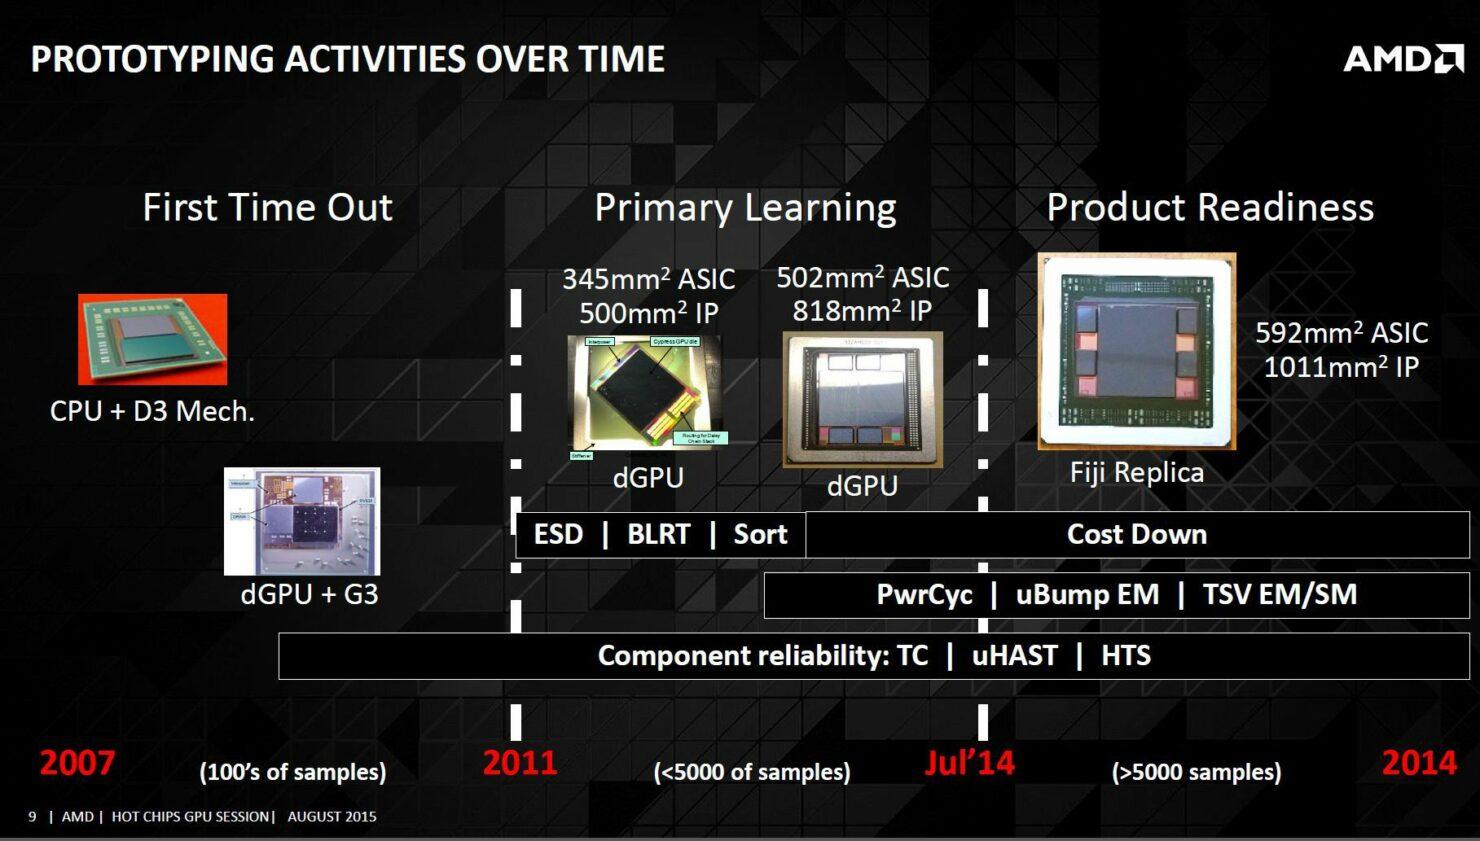 amd-hbm-prototyping